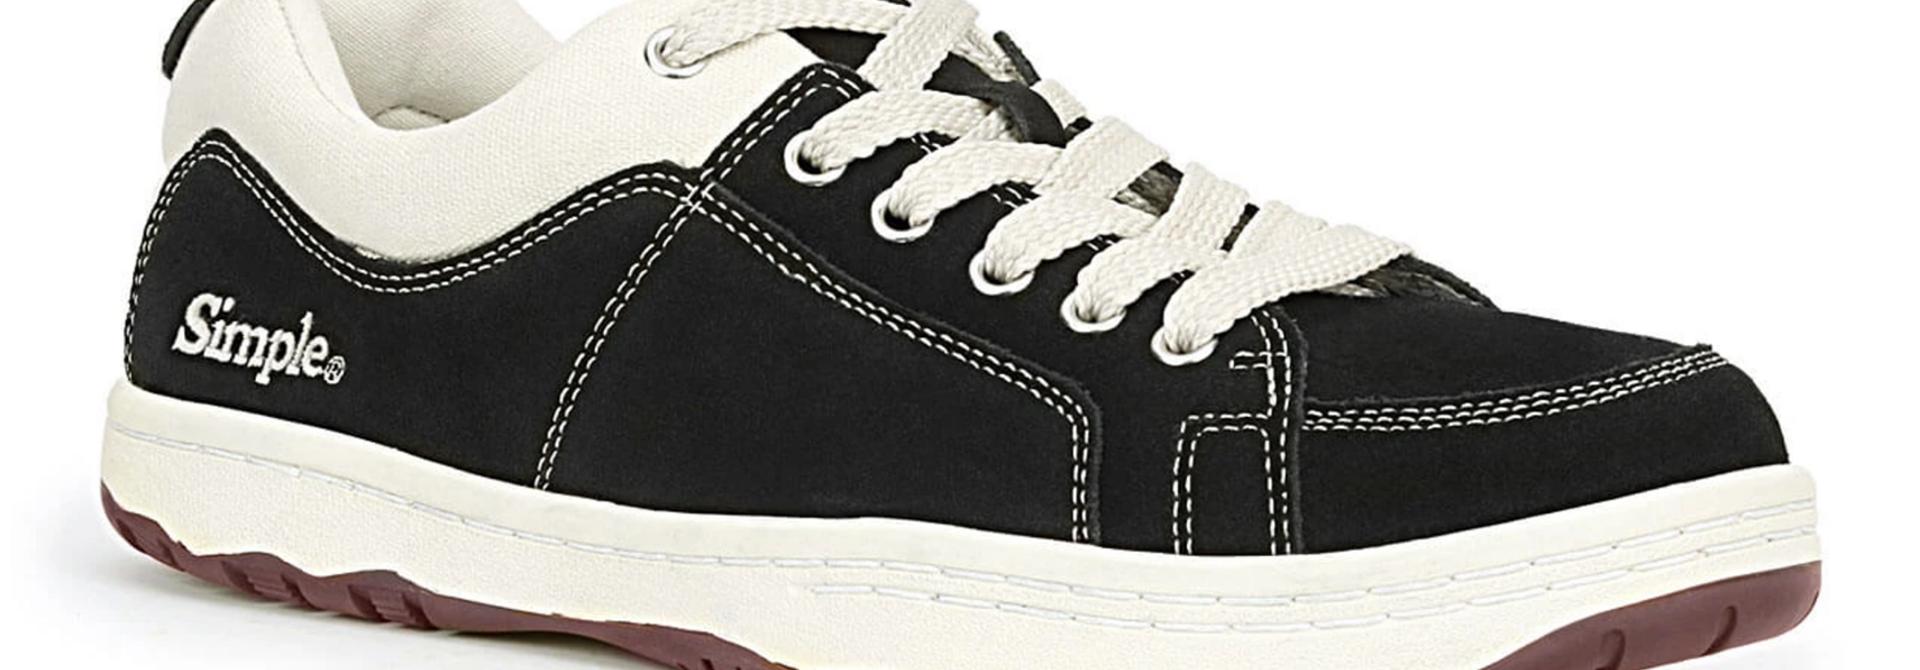 OS Sneaker, Suede, Black